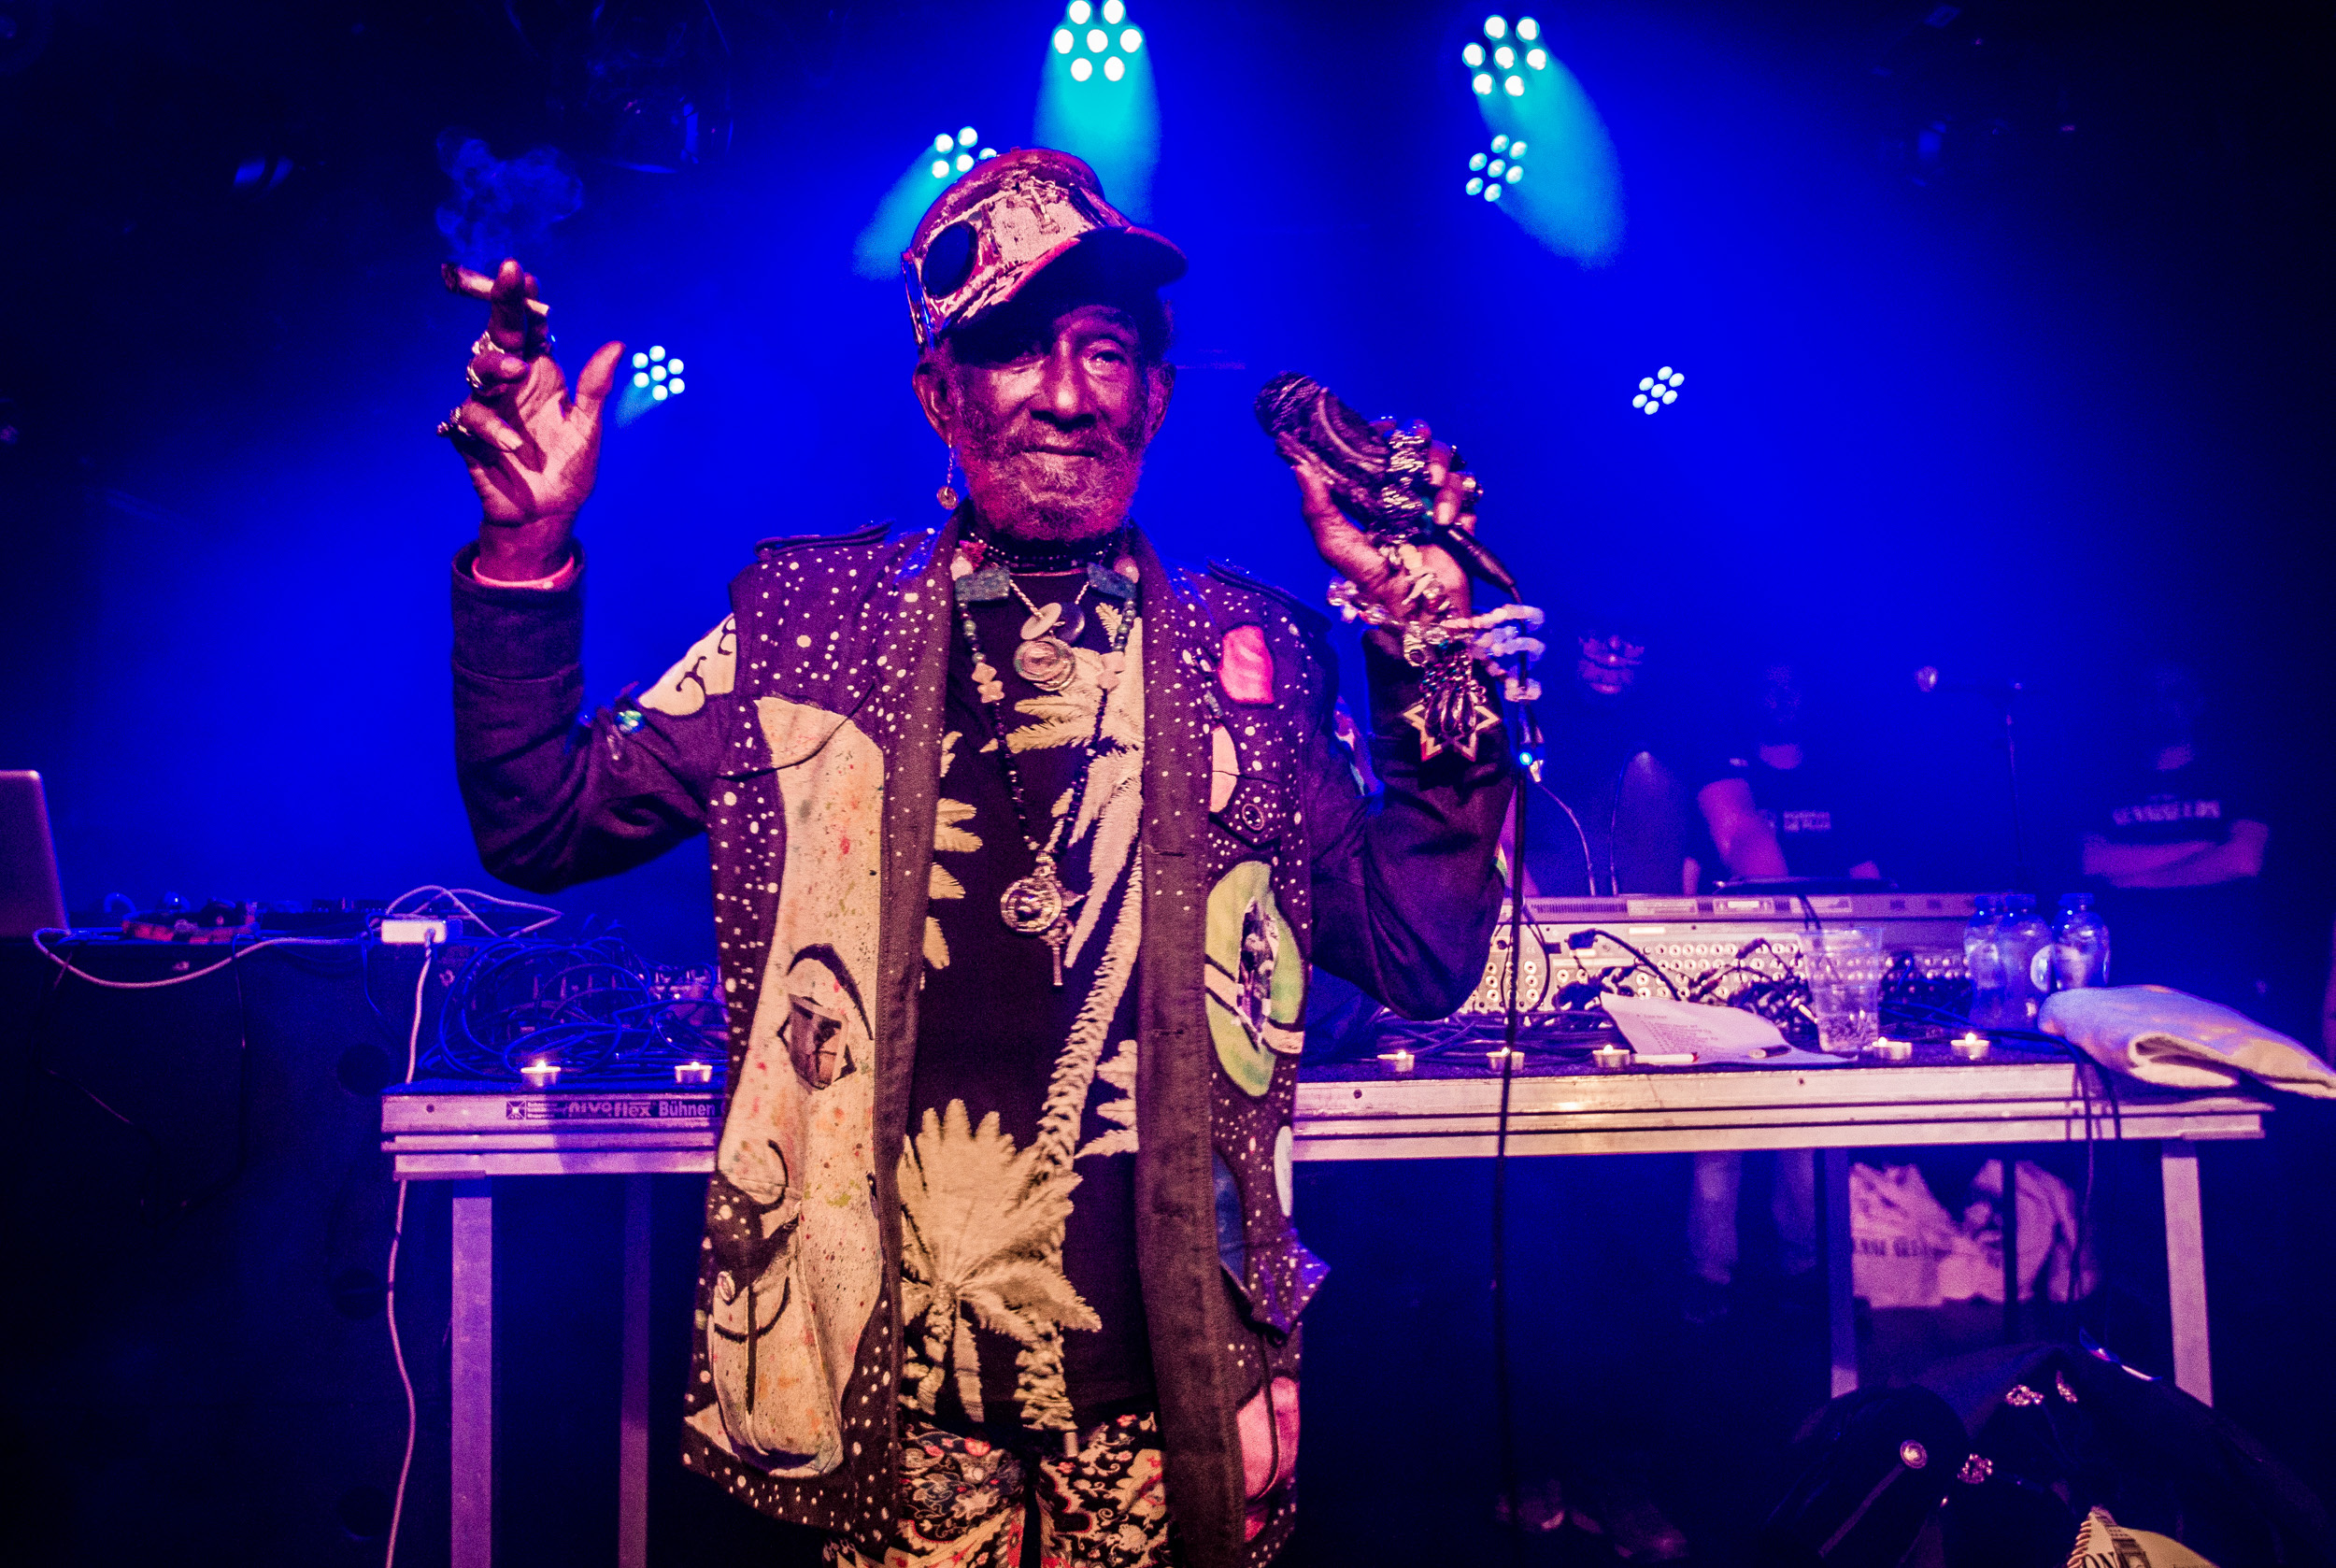 Lee 'Scratch' Perry, Reggae Legend and Dub Pioneer, Dies at 85